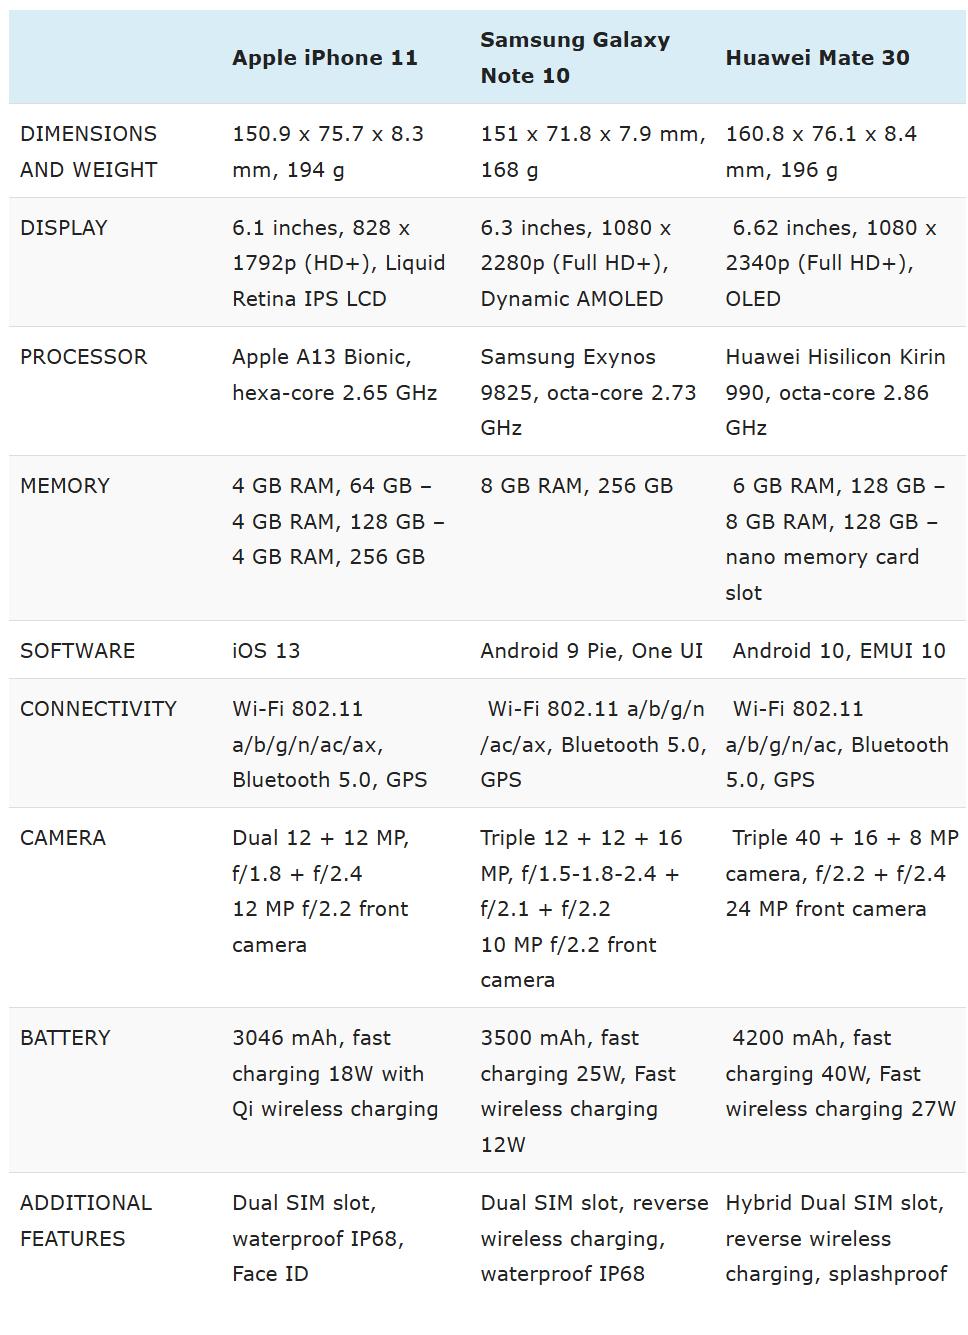 iPhone 11 vs Huawei Mate 30 vs Samsung Galaxy Note 10 specs